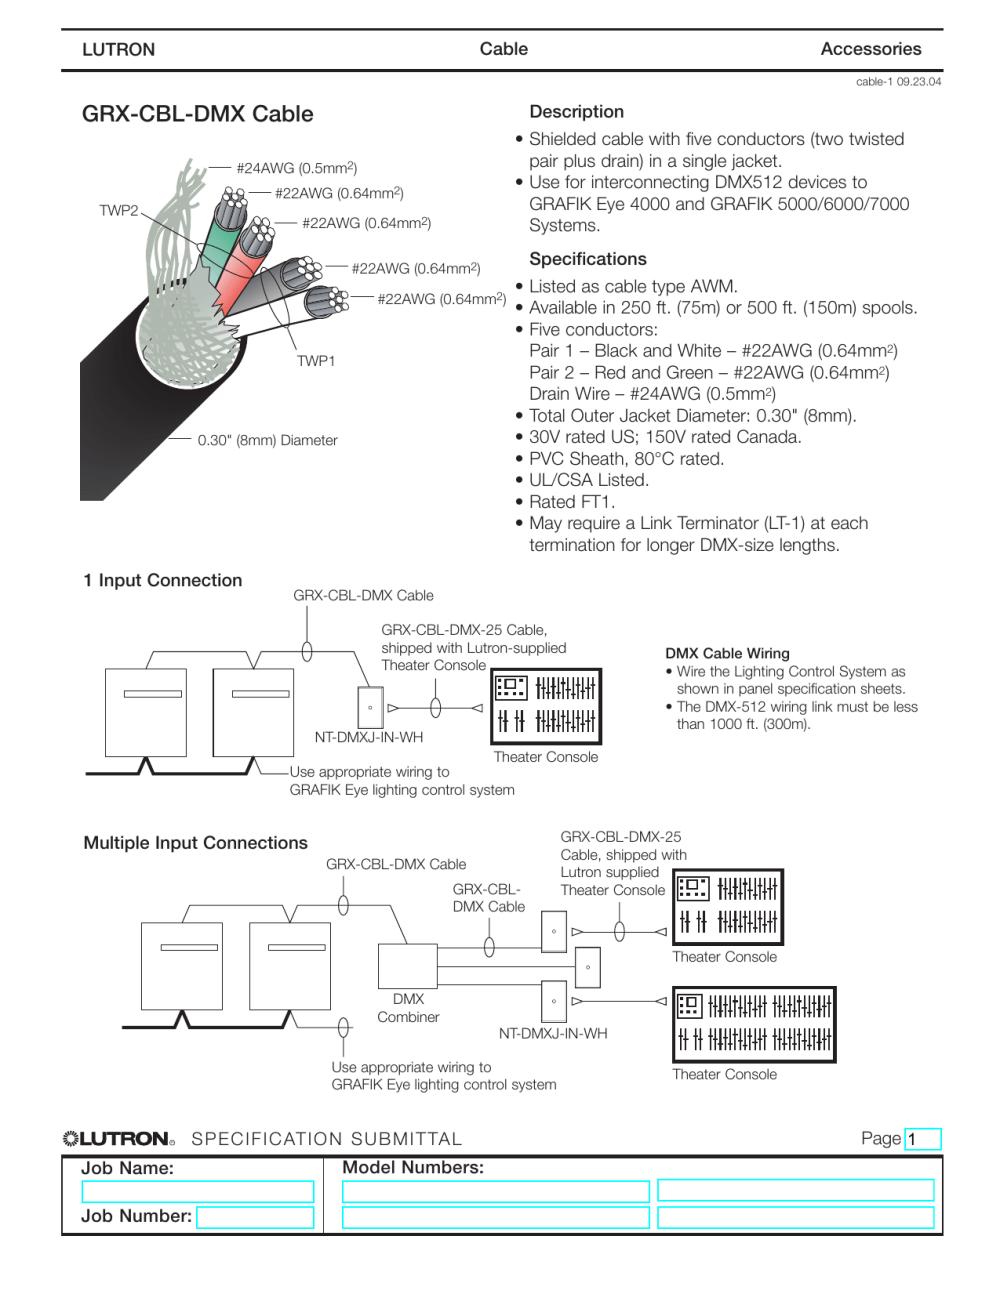 medium resolution of grx cbl dmx cable